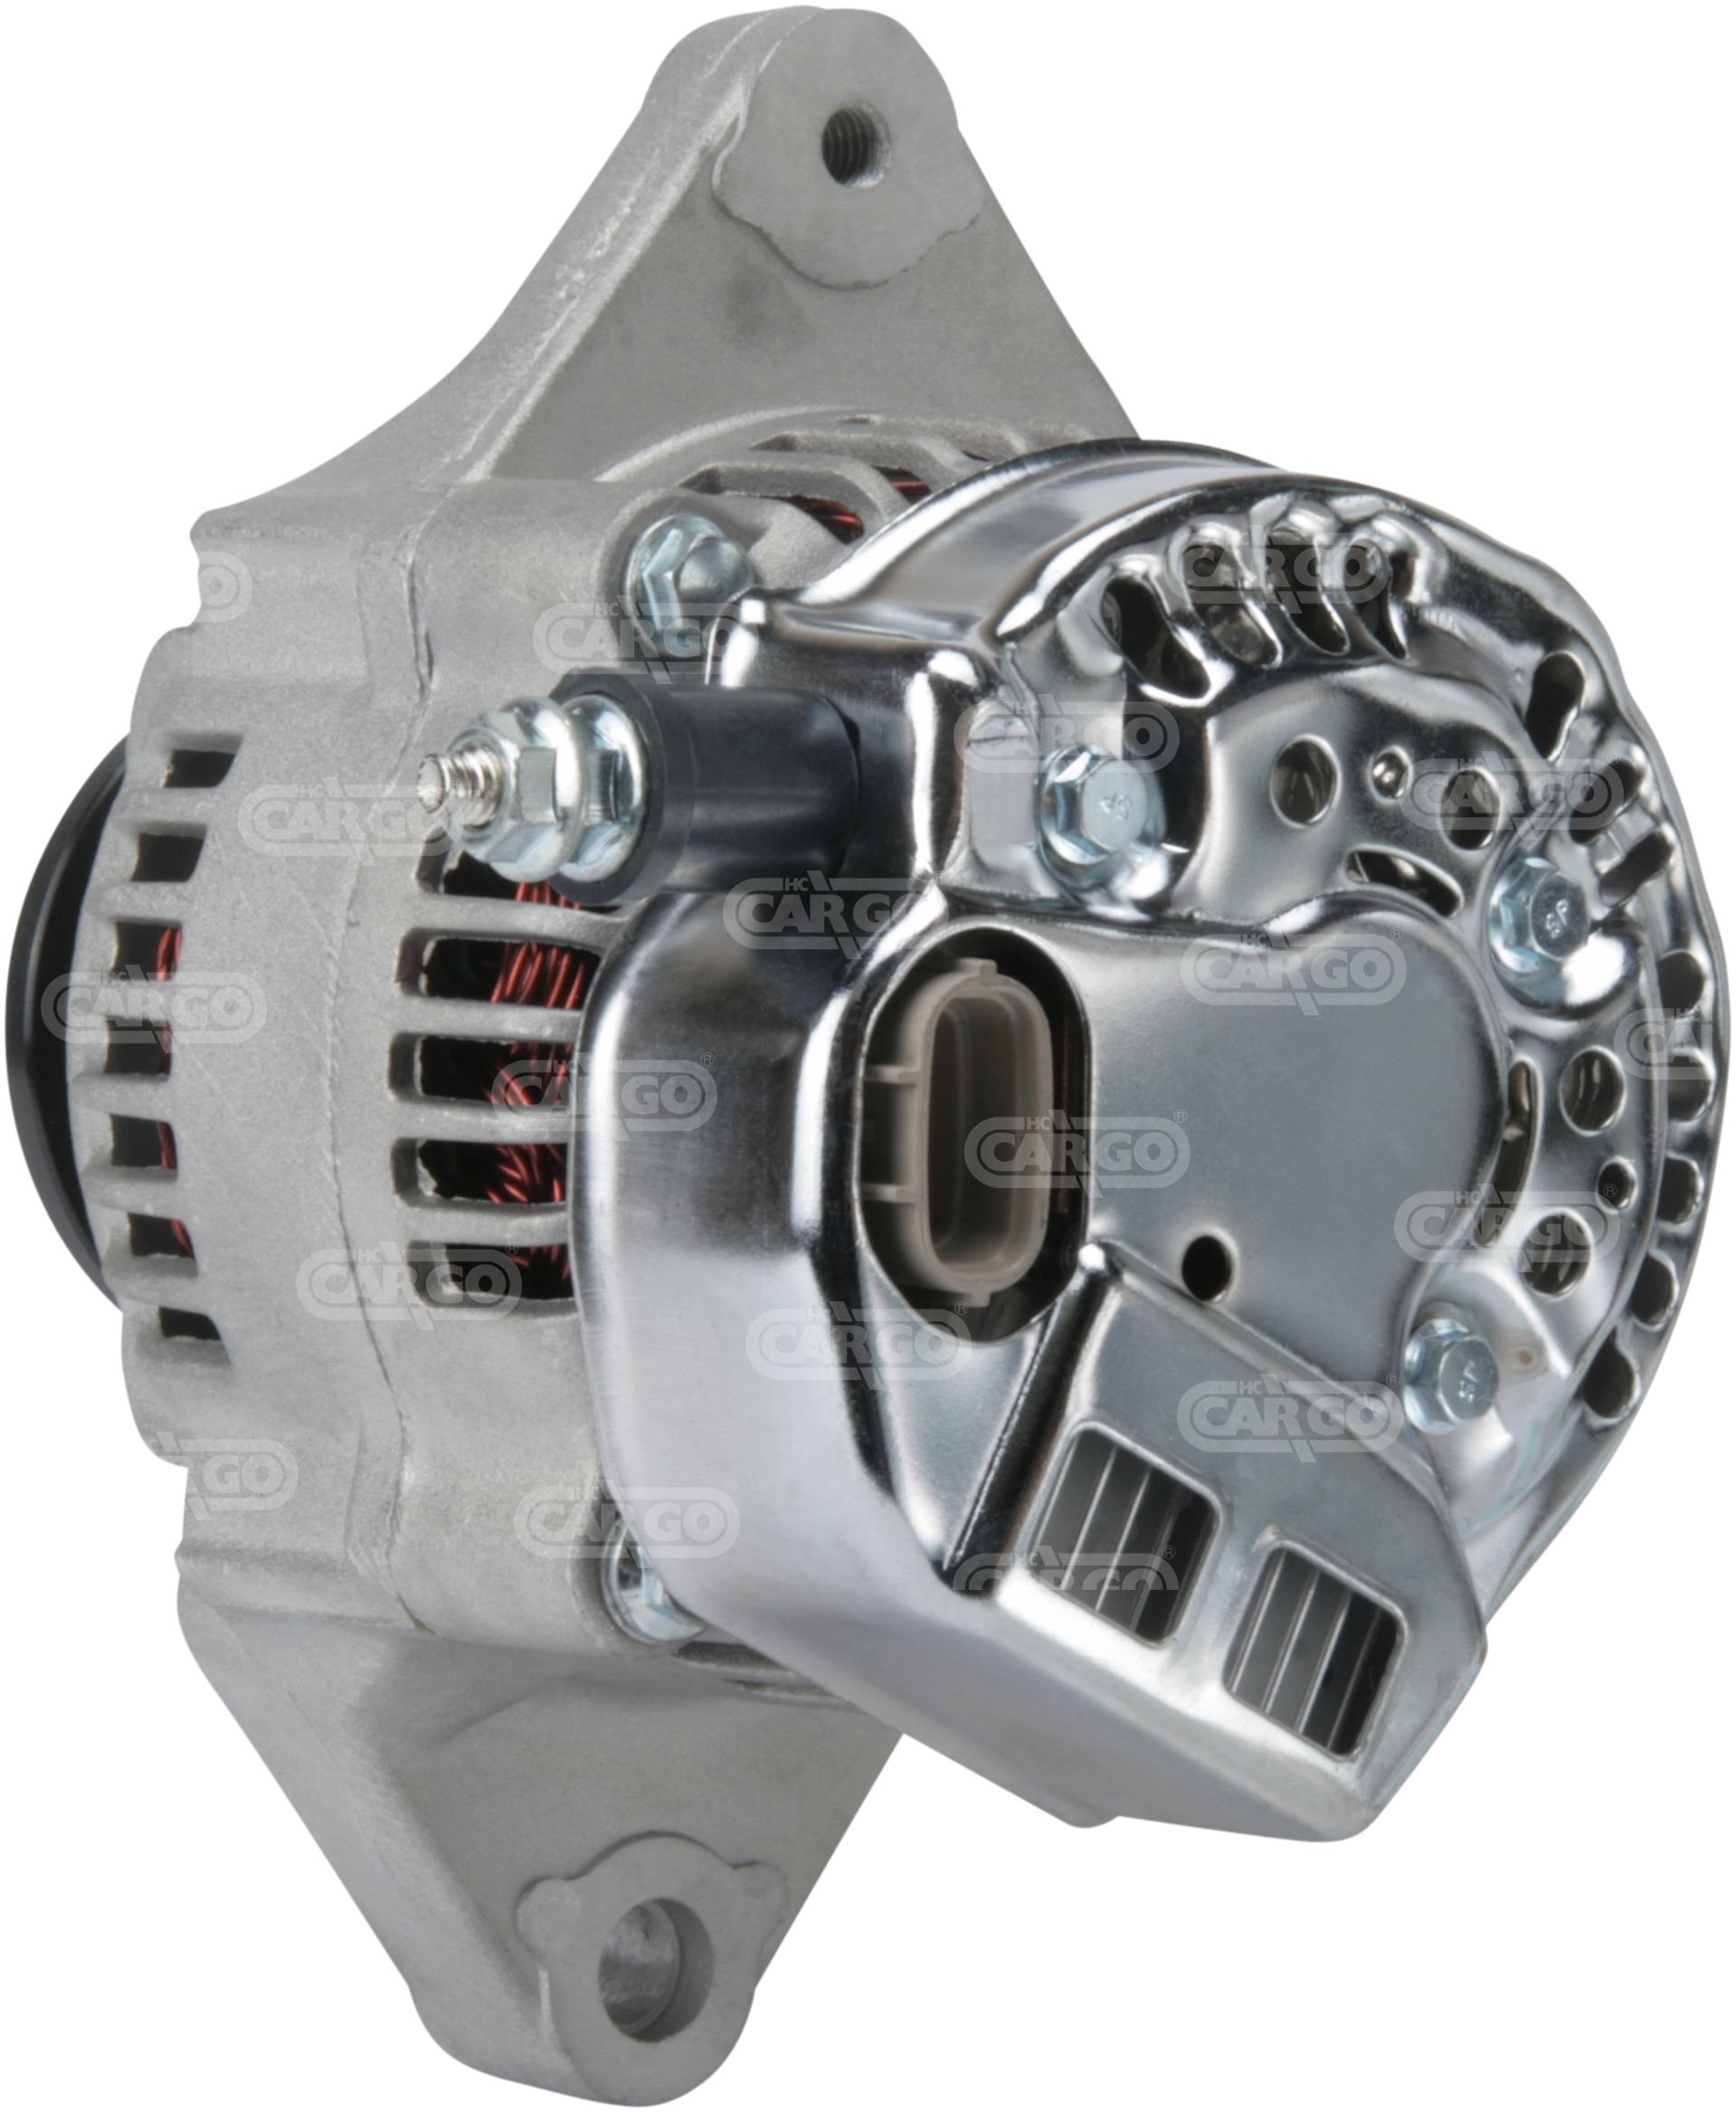 Alternateur 518 Voltage14 Amp55